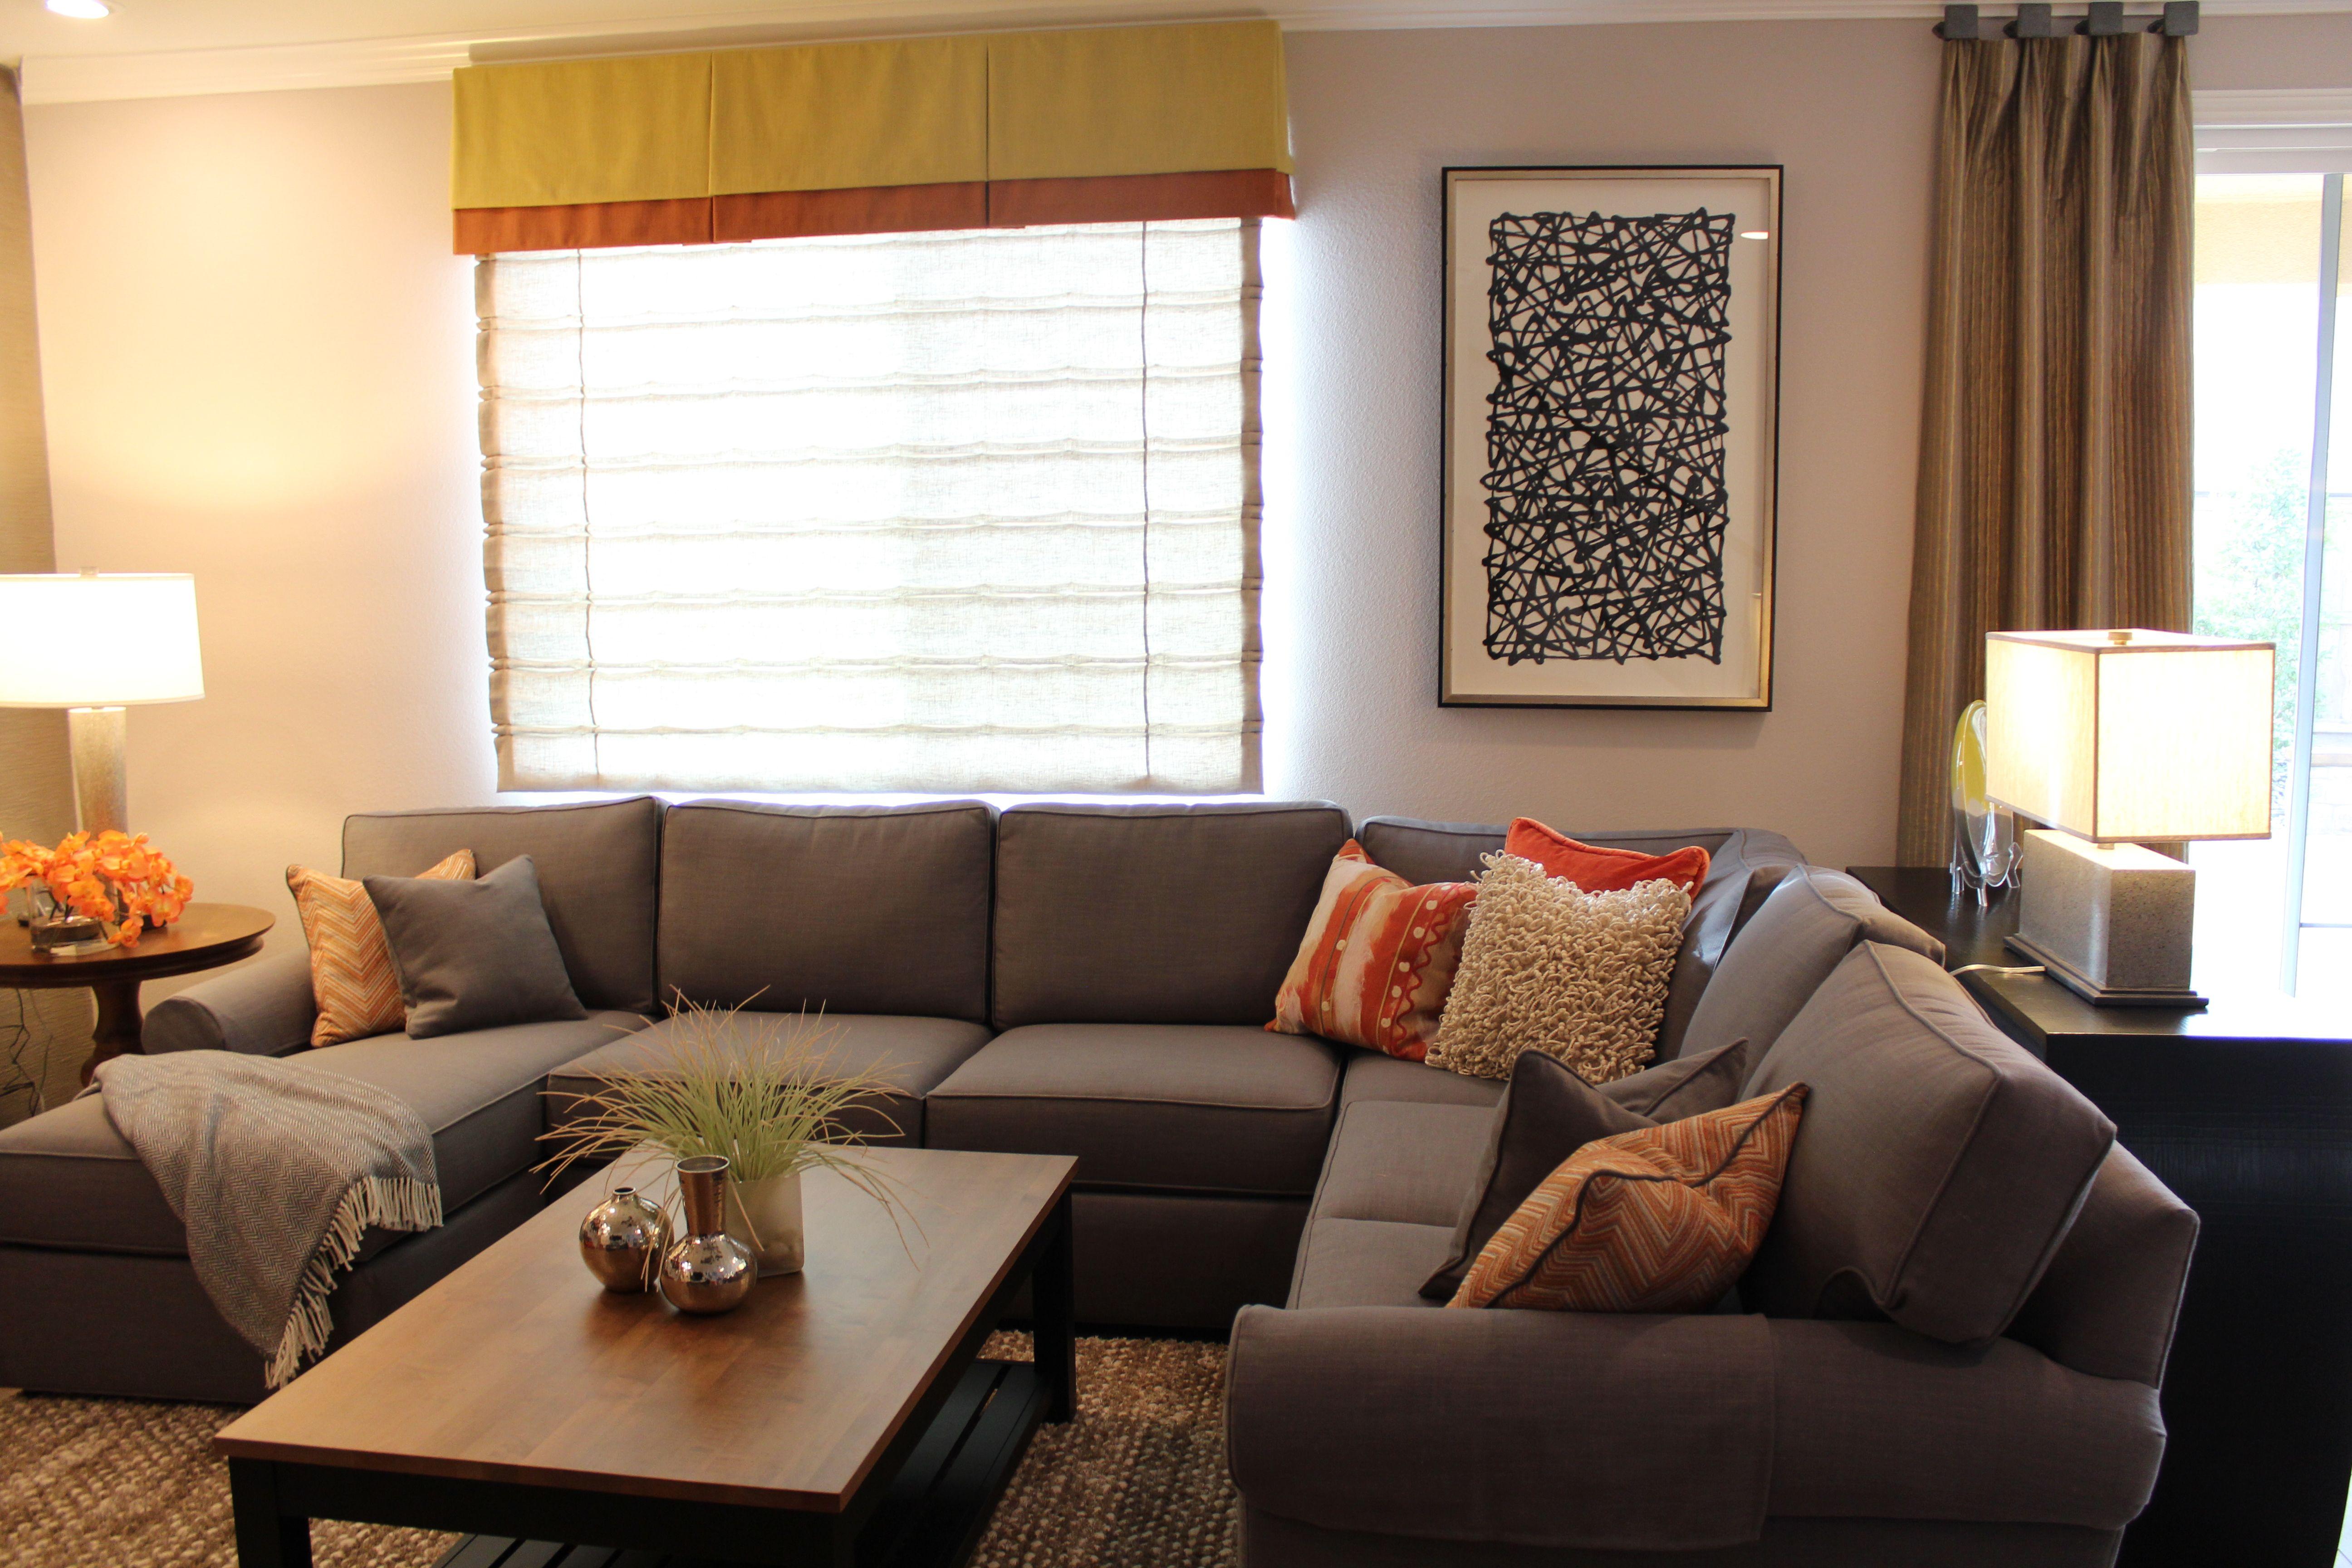 Grey Linen Ethan Allen Retreat Sectional Mila Concrete Lamps - Conversation sofa ethan allen bennett roll arm